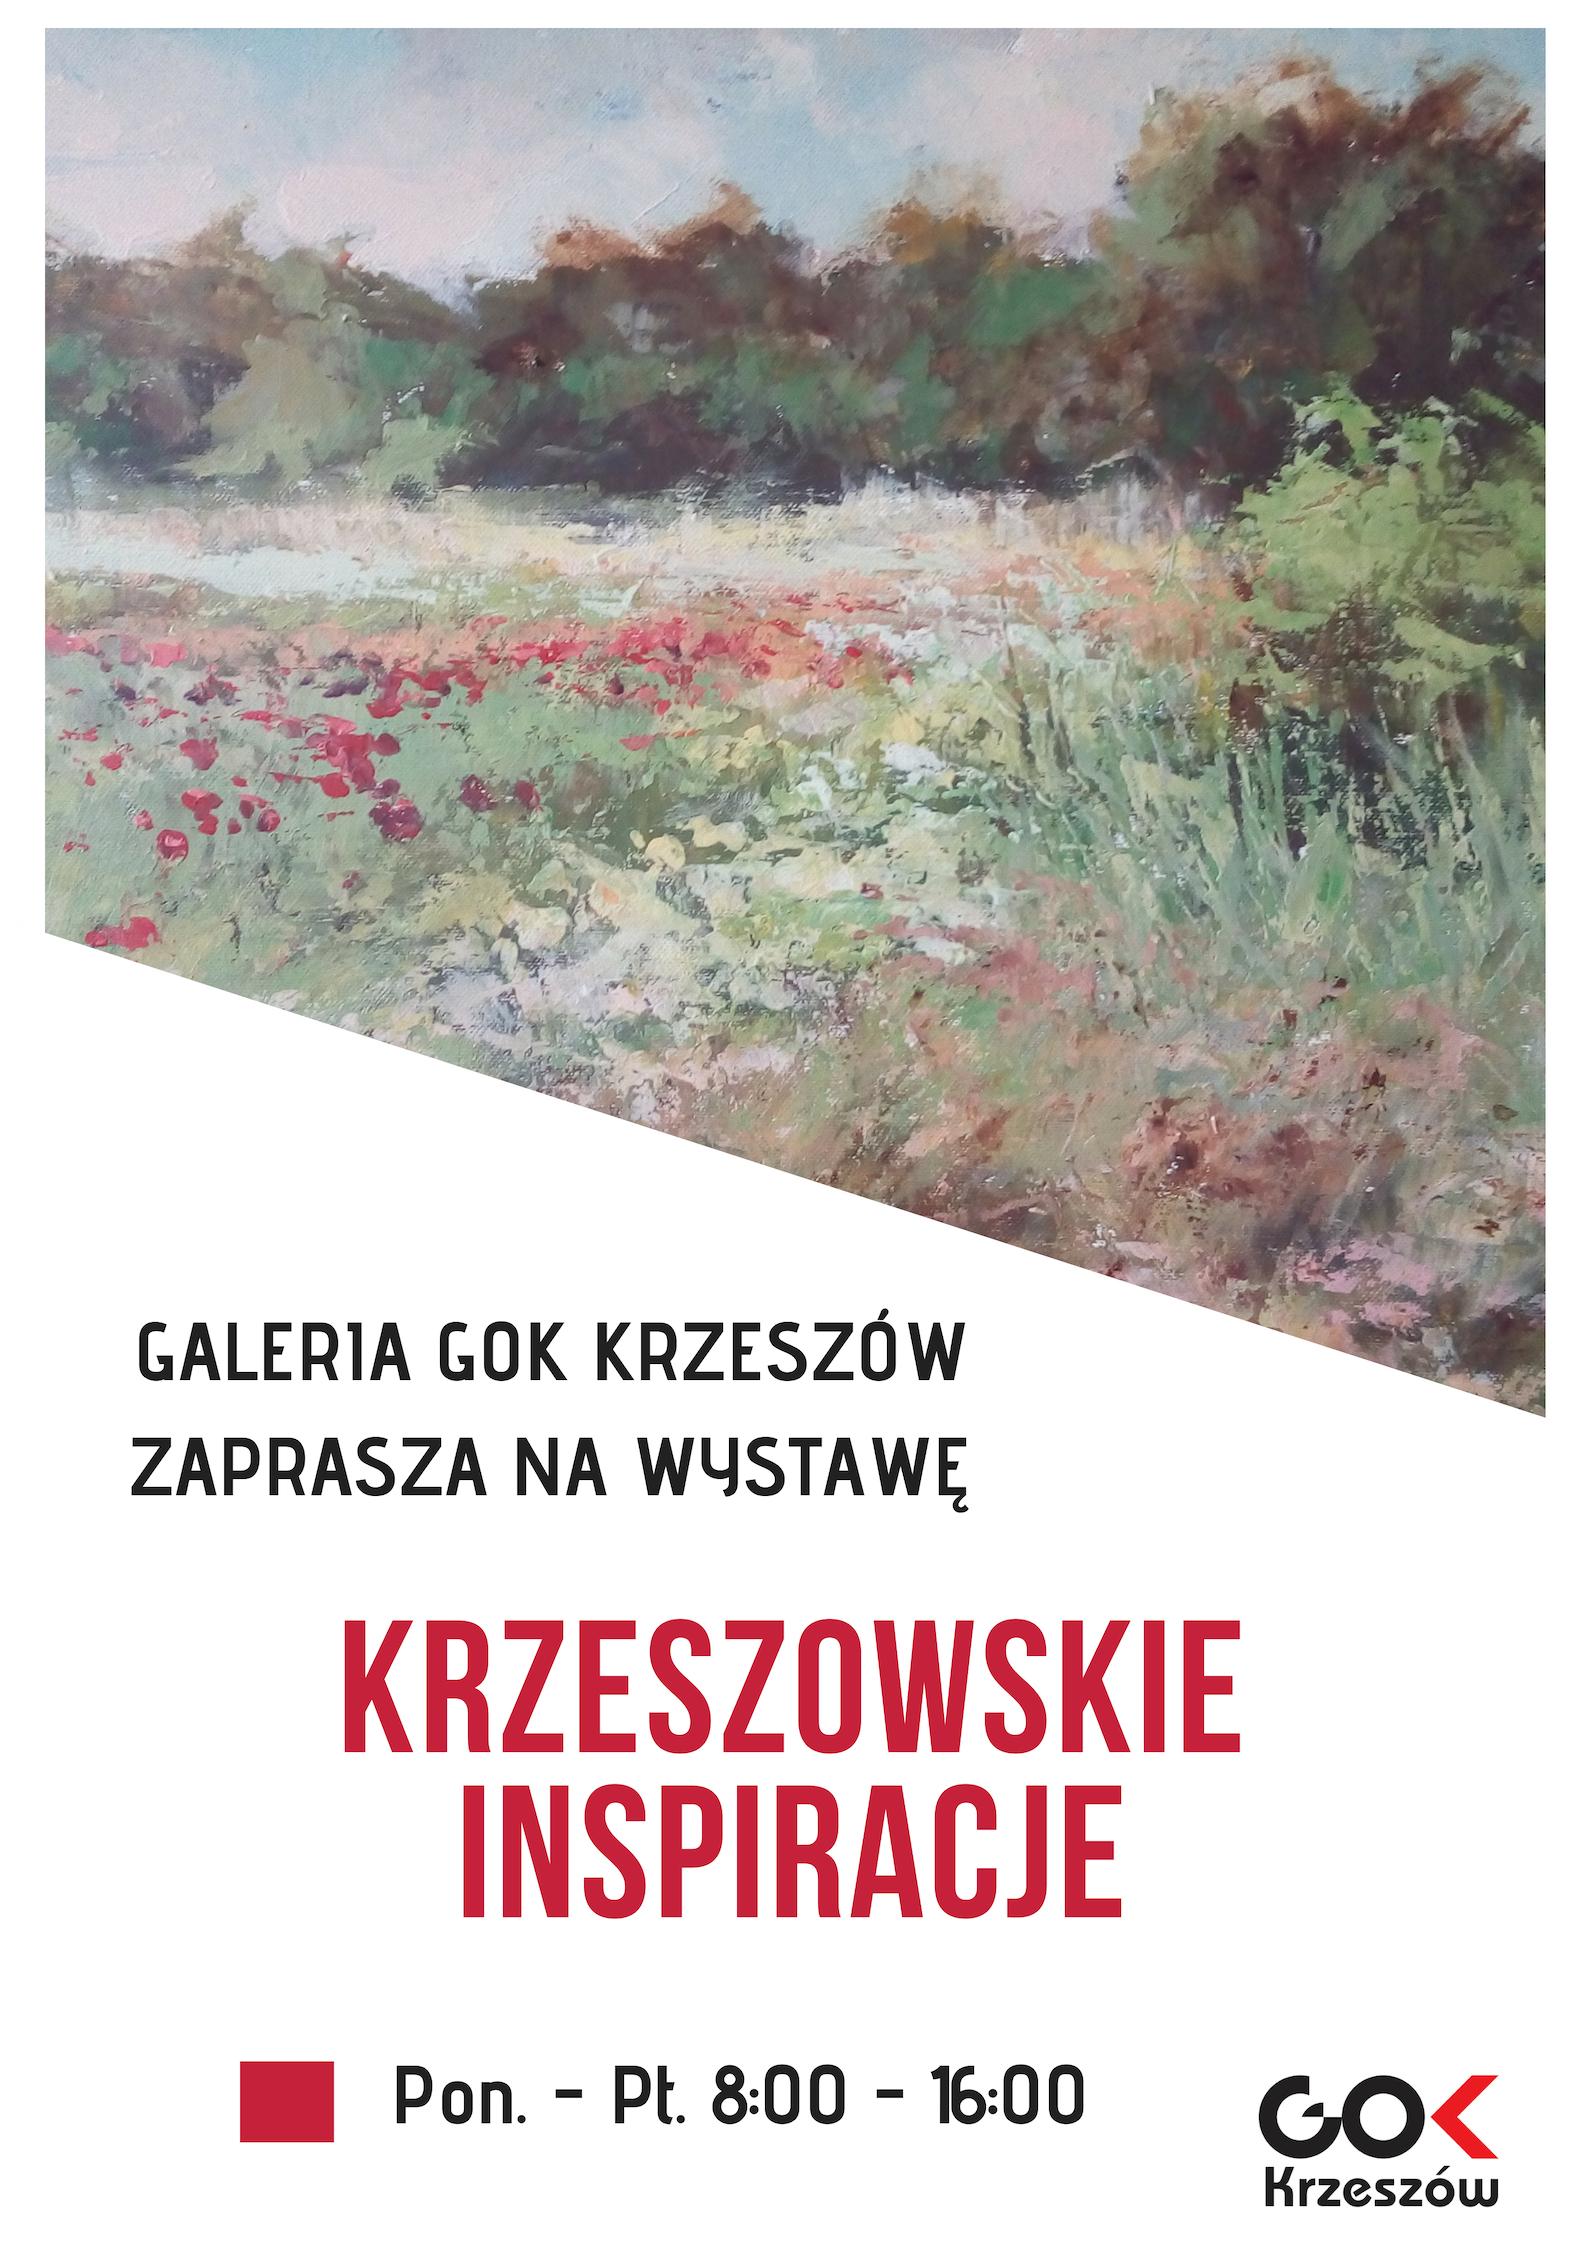 GALERIA GOK ZAPRASZA